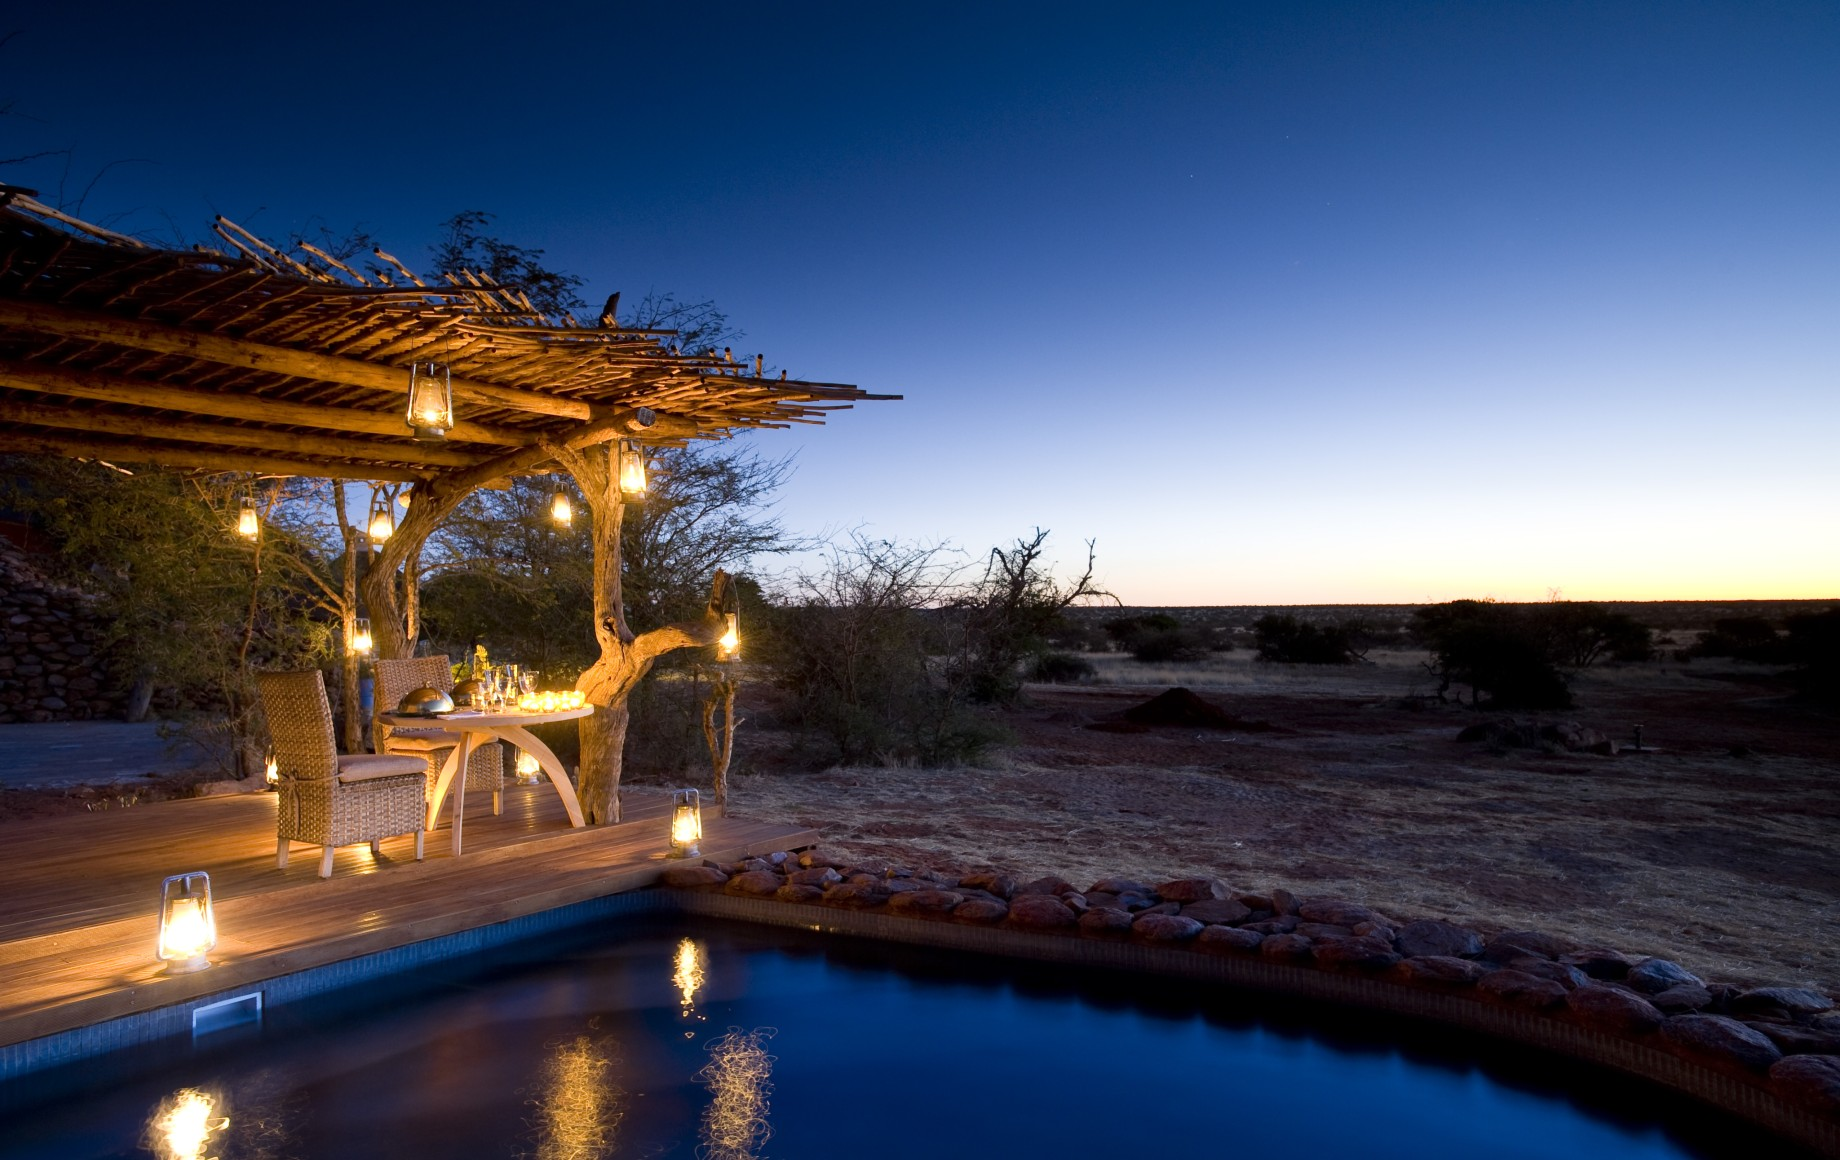 the pool at dusk at Tswalu Motse